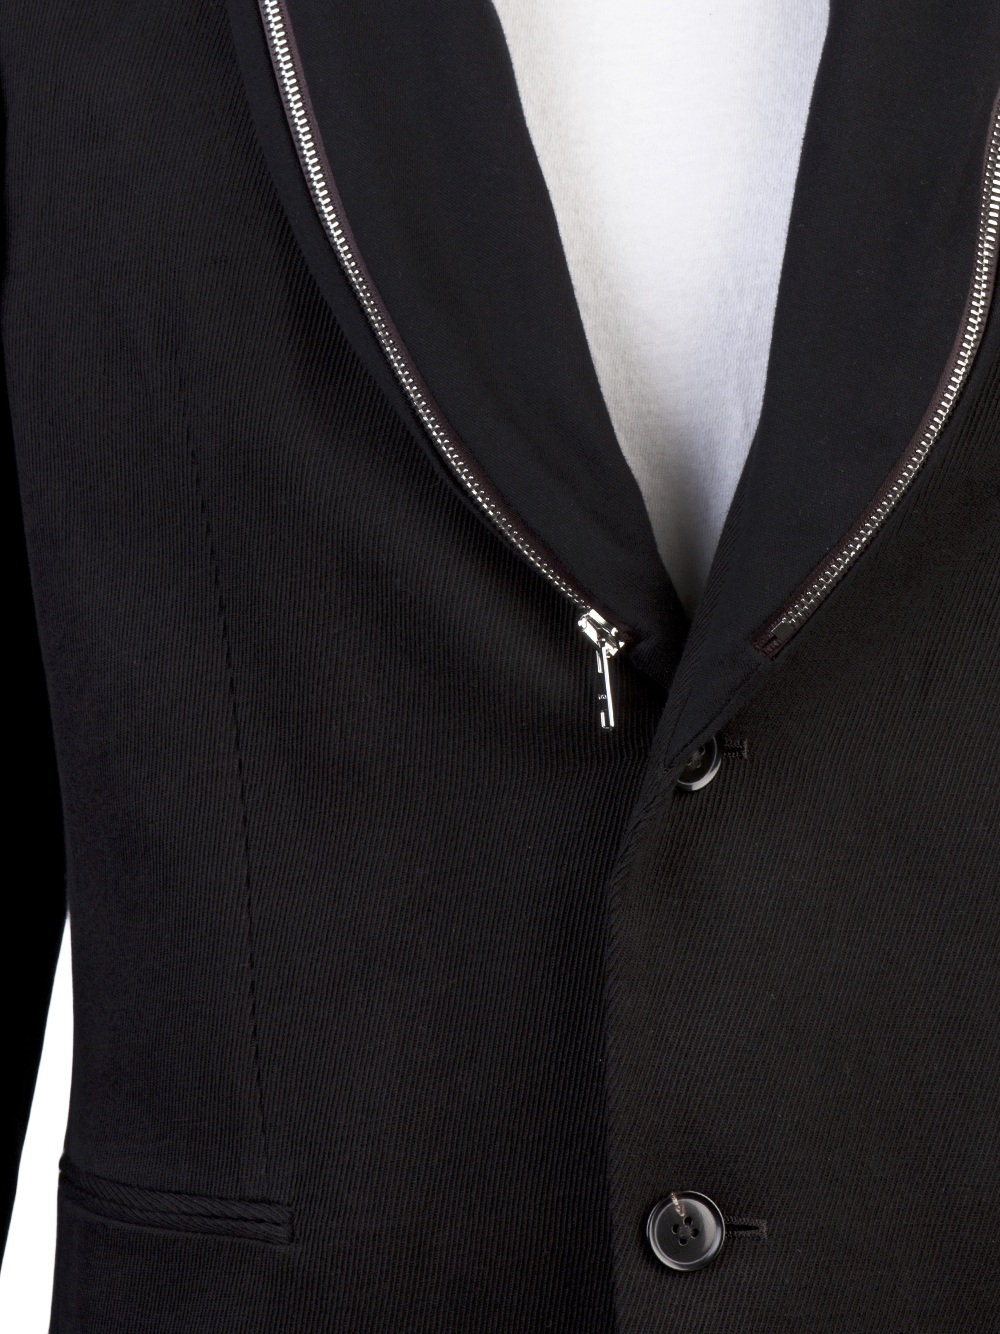 Paul Smith Zipper Shawl Collar Jacket in Black for Men